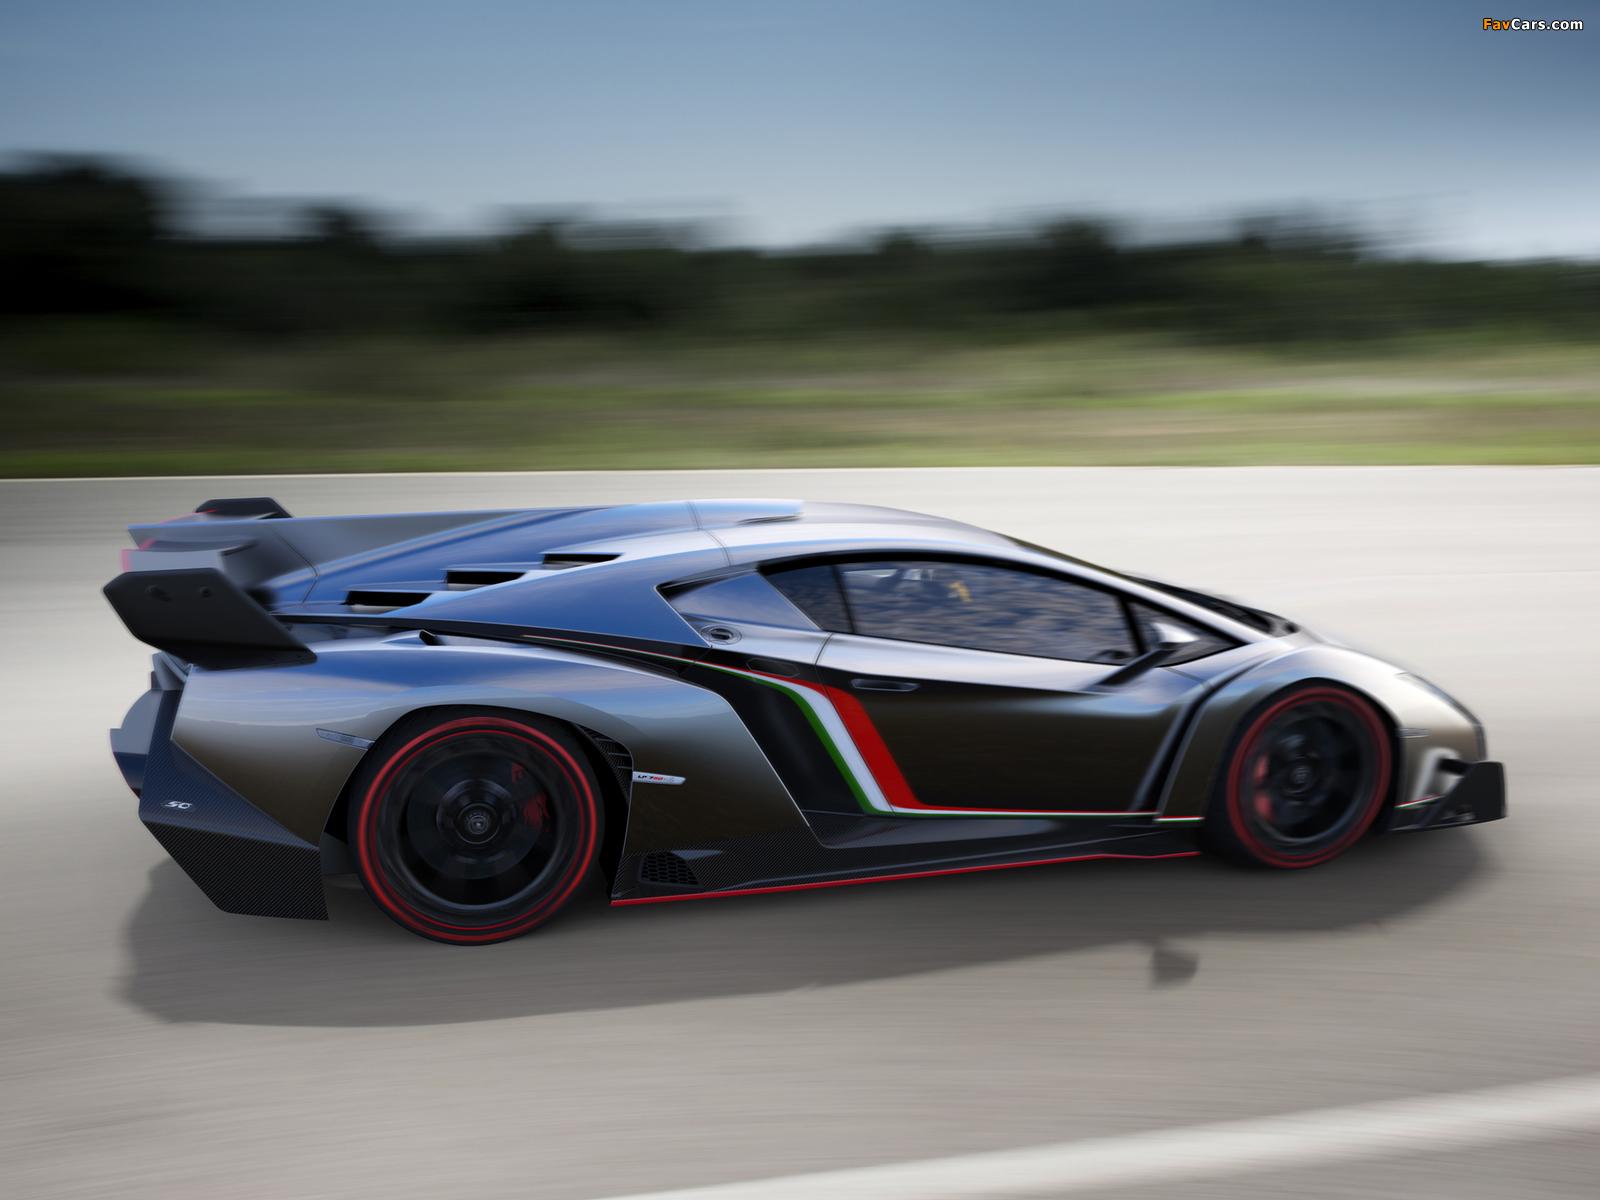 Lamborghini Veneno 2013 photos (1600 x 1200)